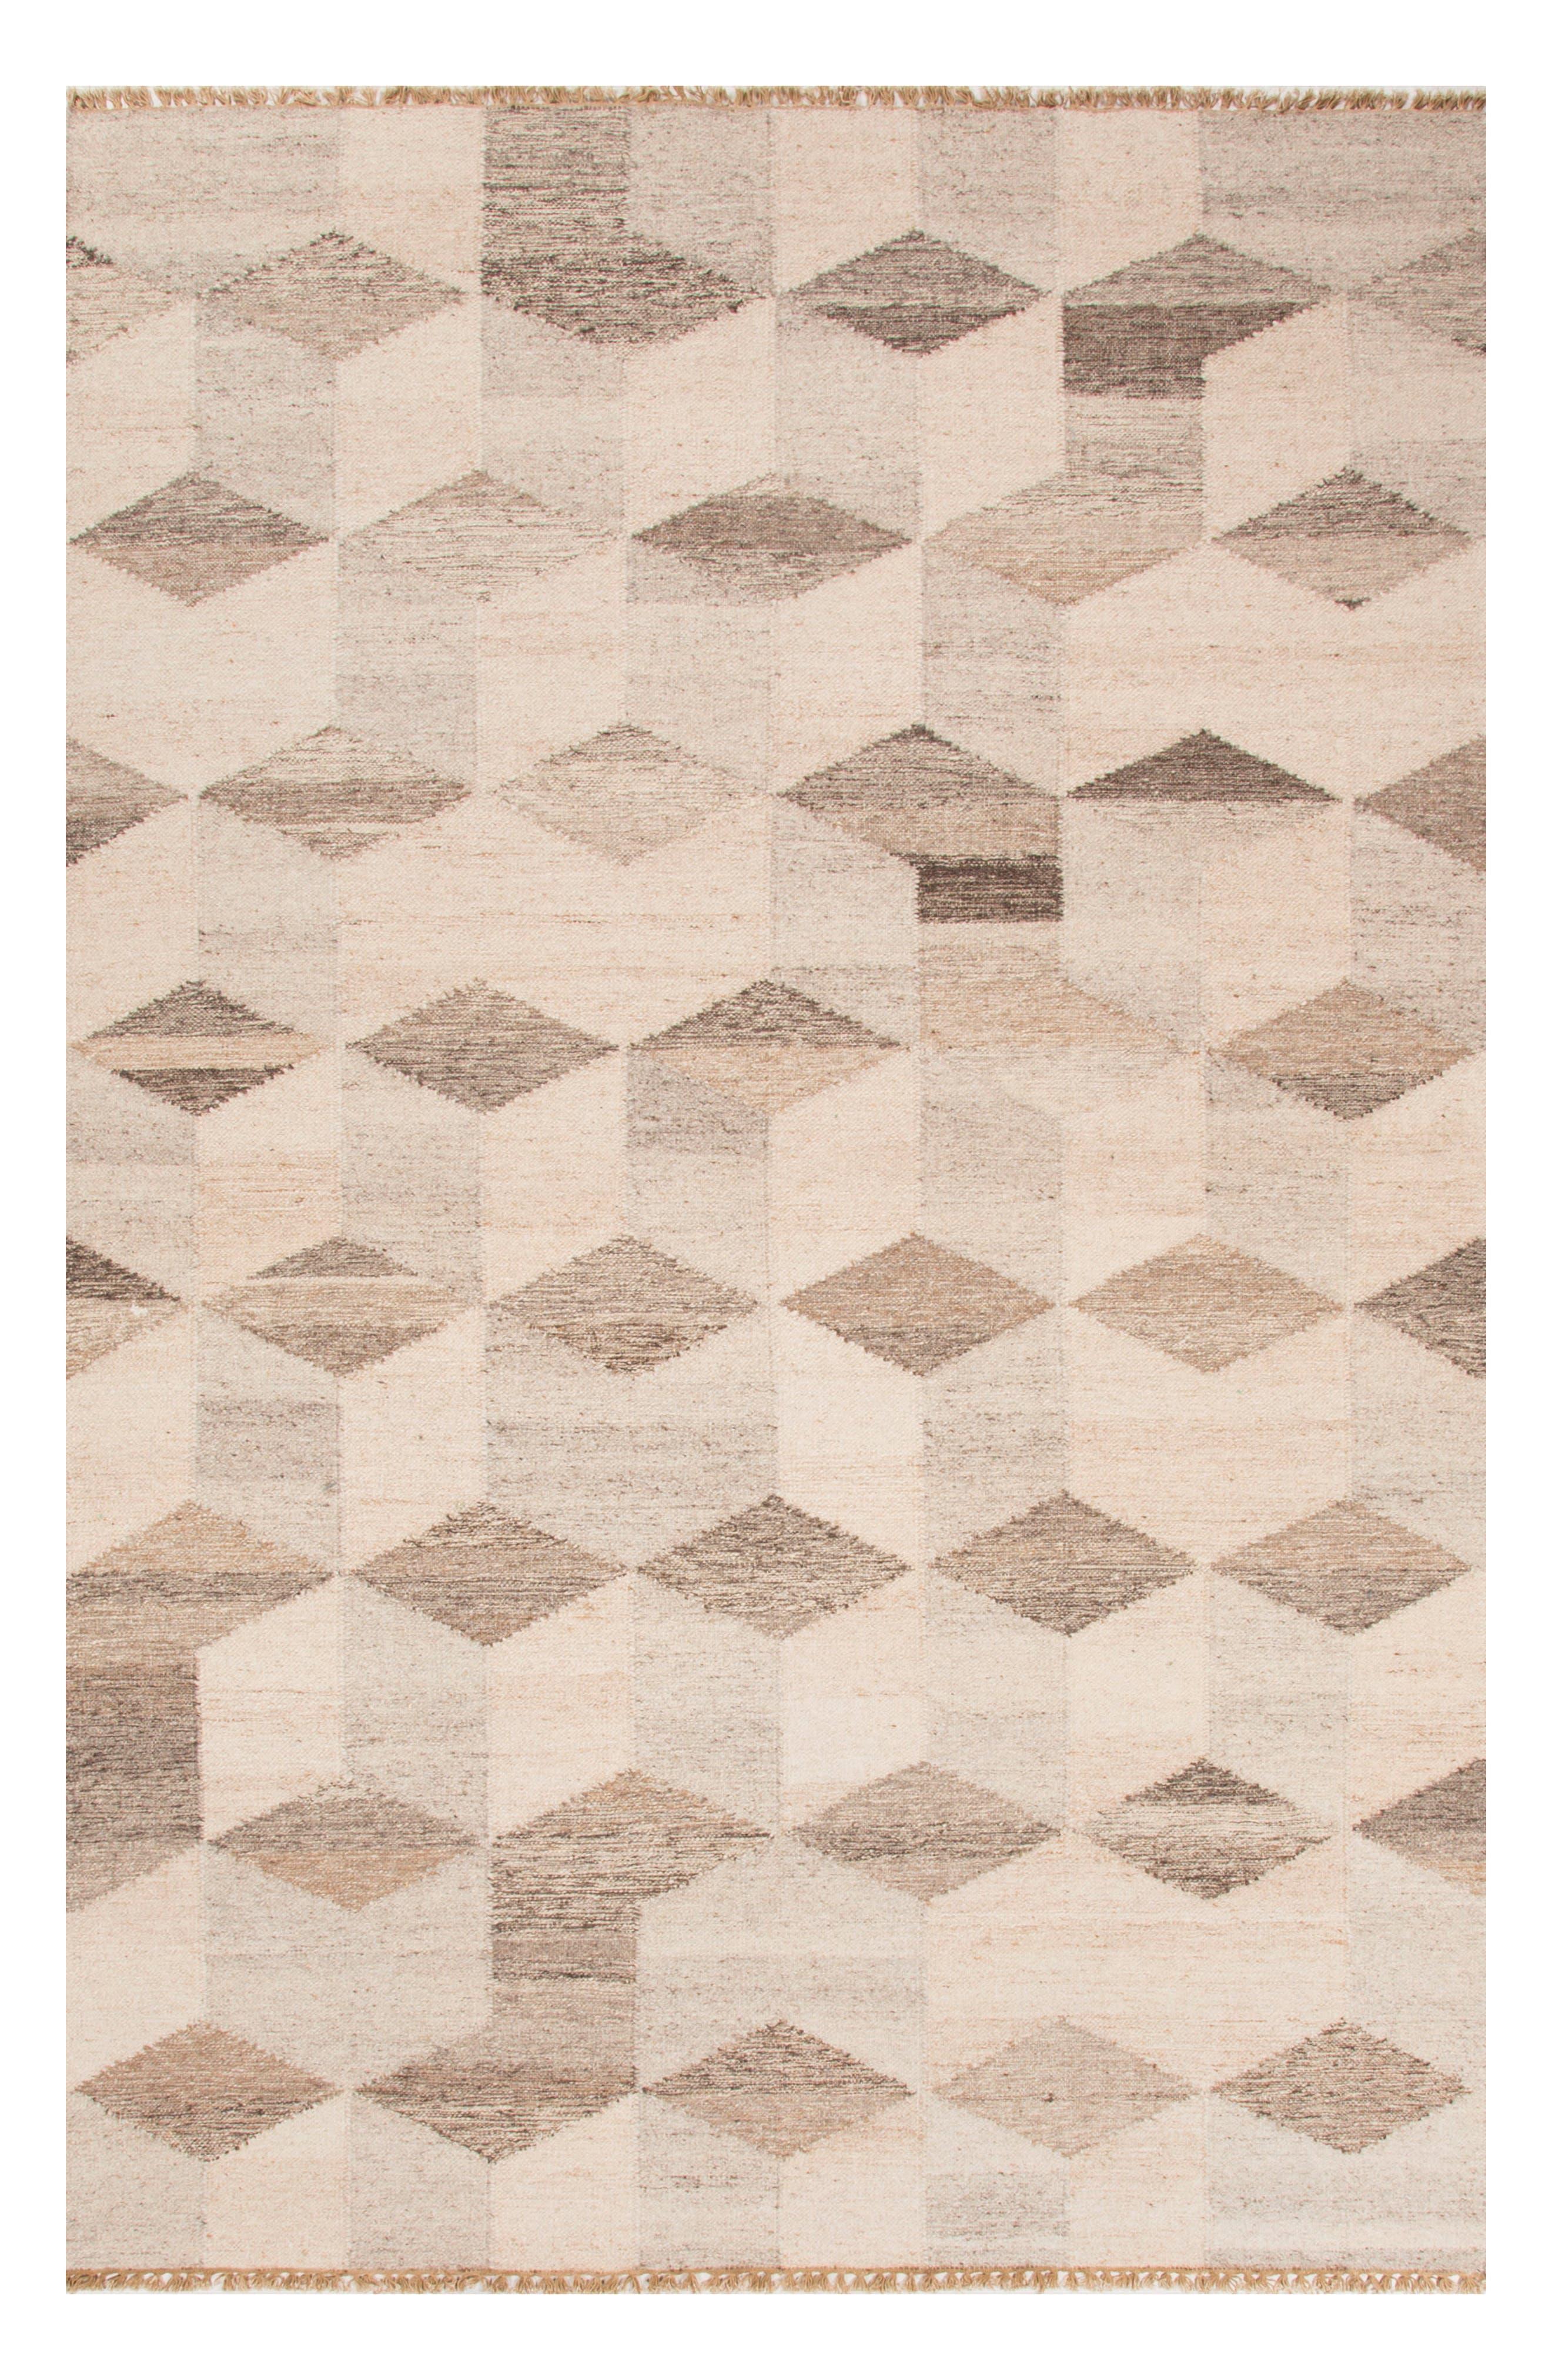 Main Image - Jaipur Pyramid Blocks Wool Rug